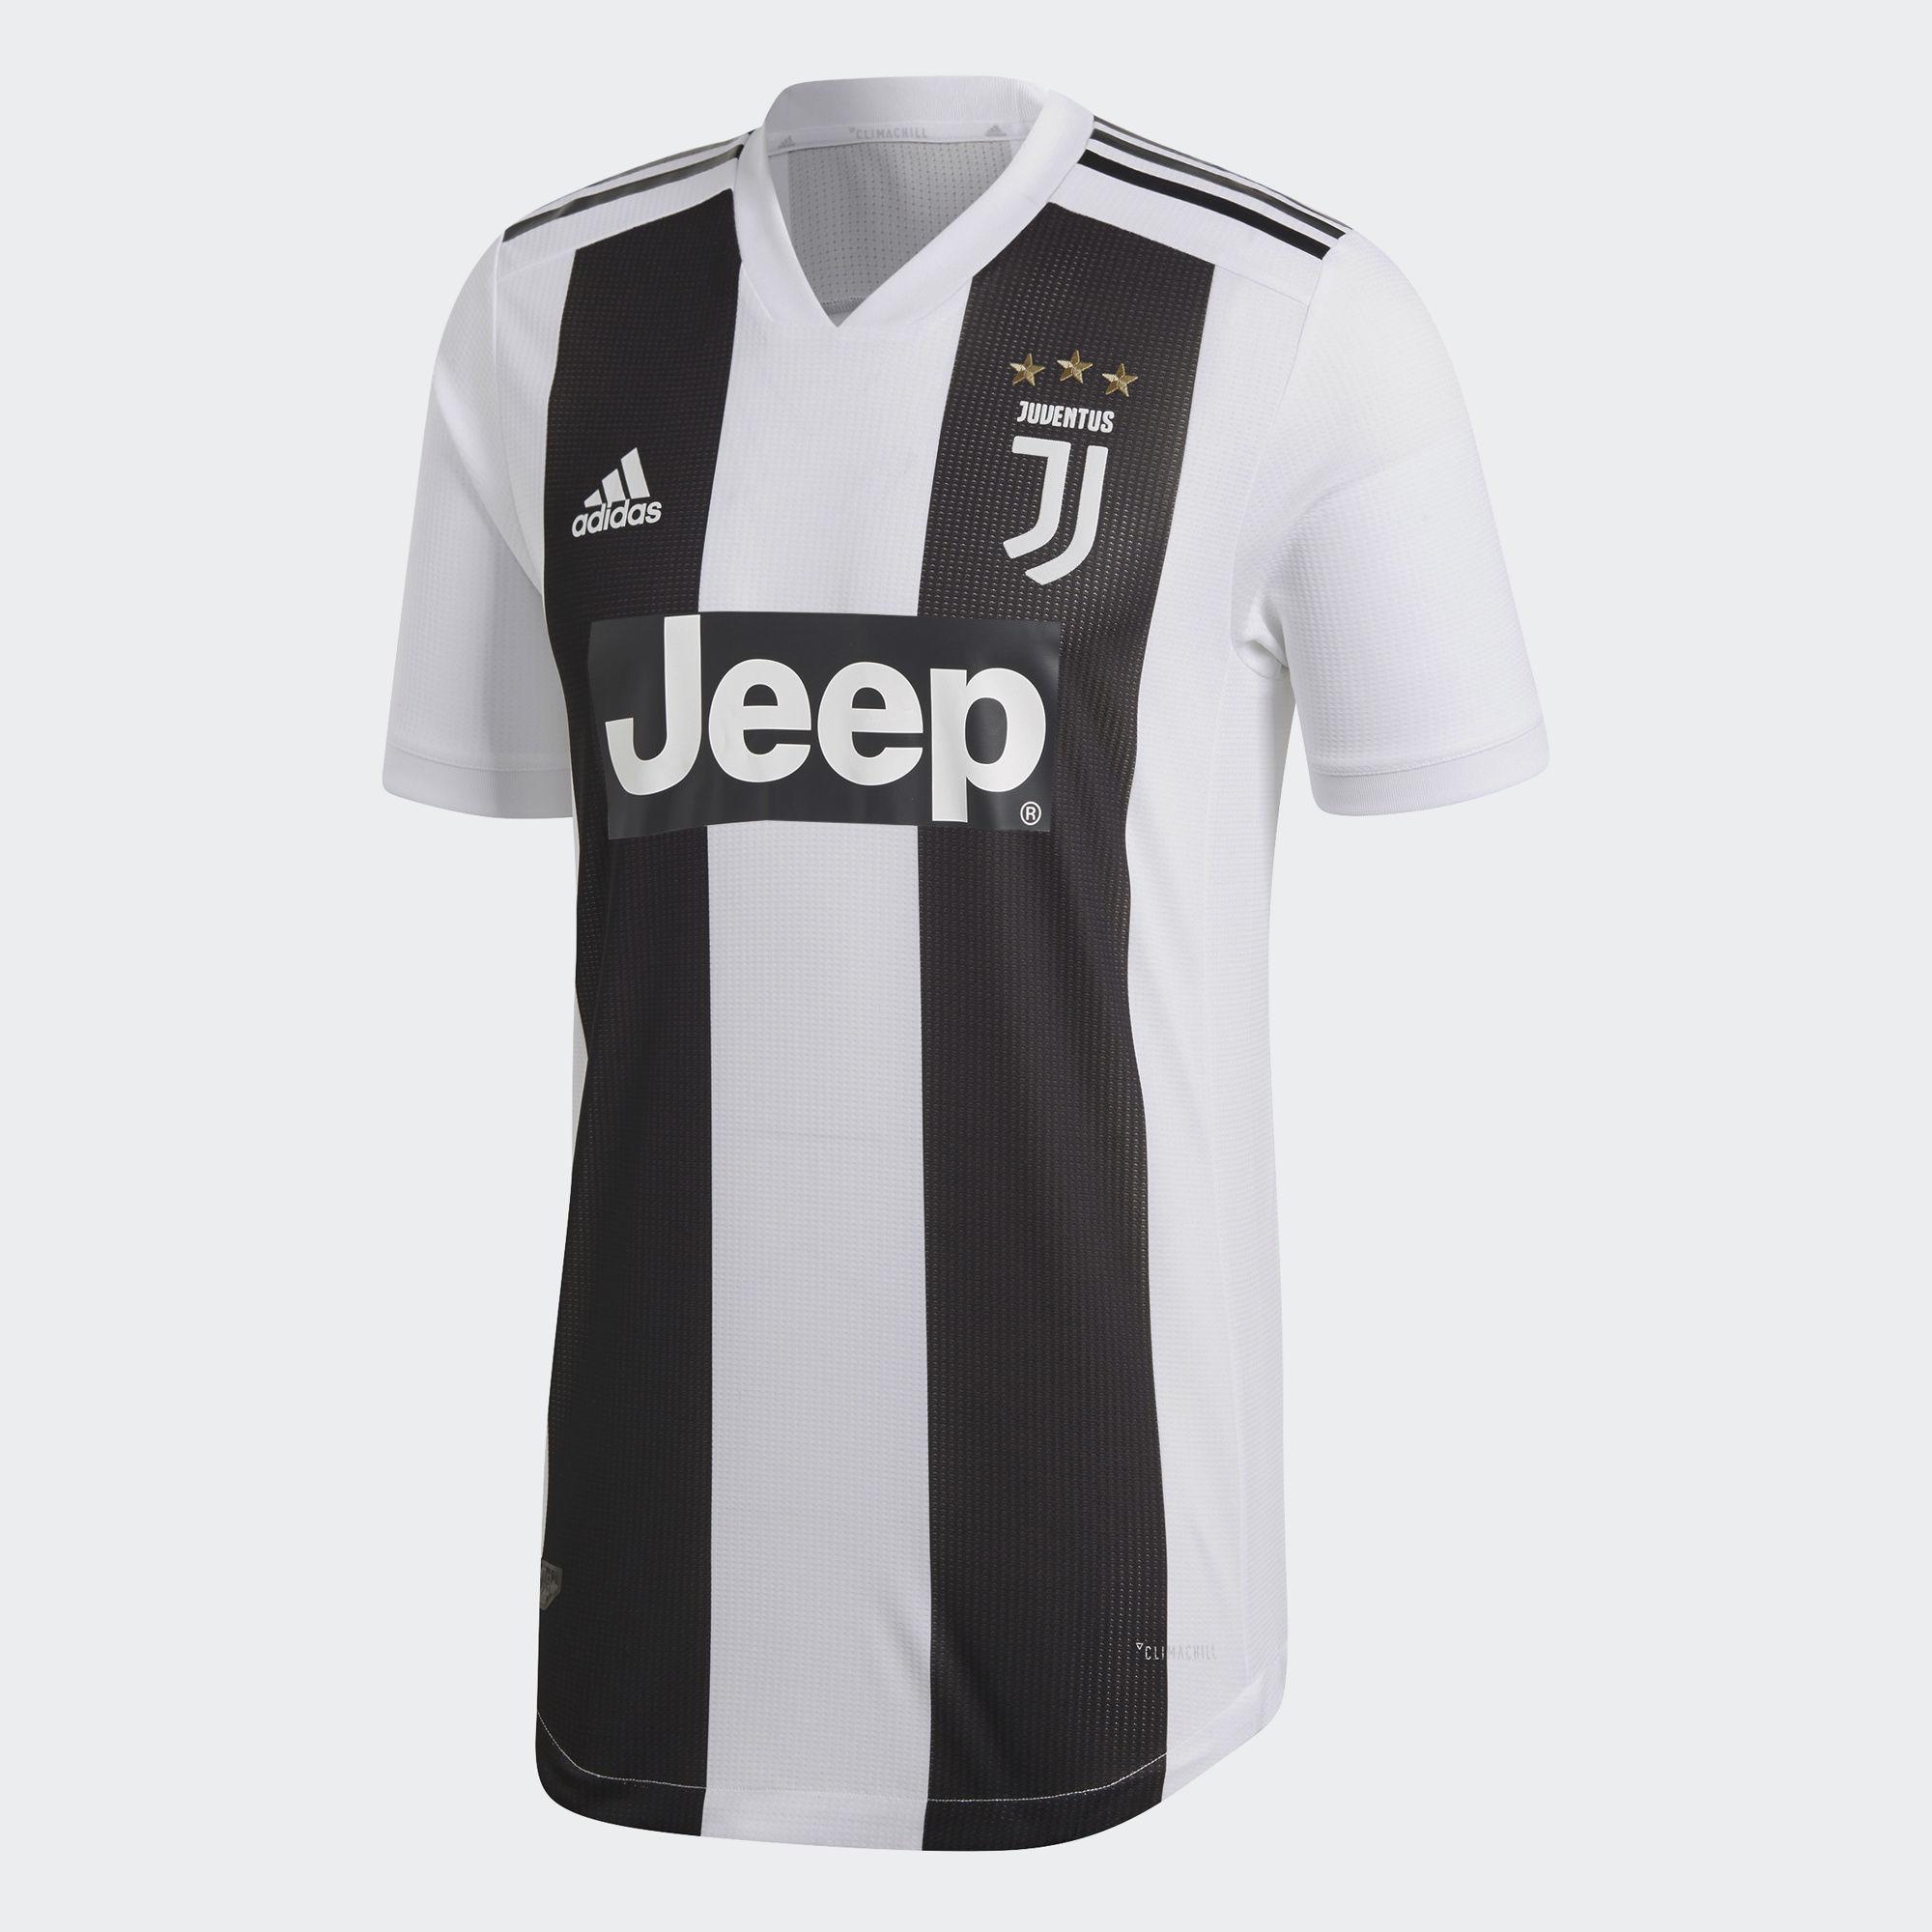 Juventus FC 2018 2019 Home Kit Men s Soccer Jersey Football ... 578c15ece